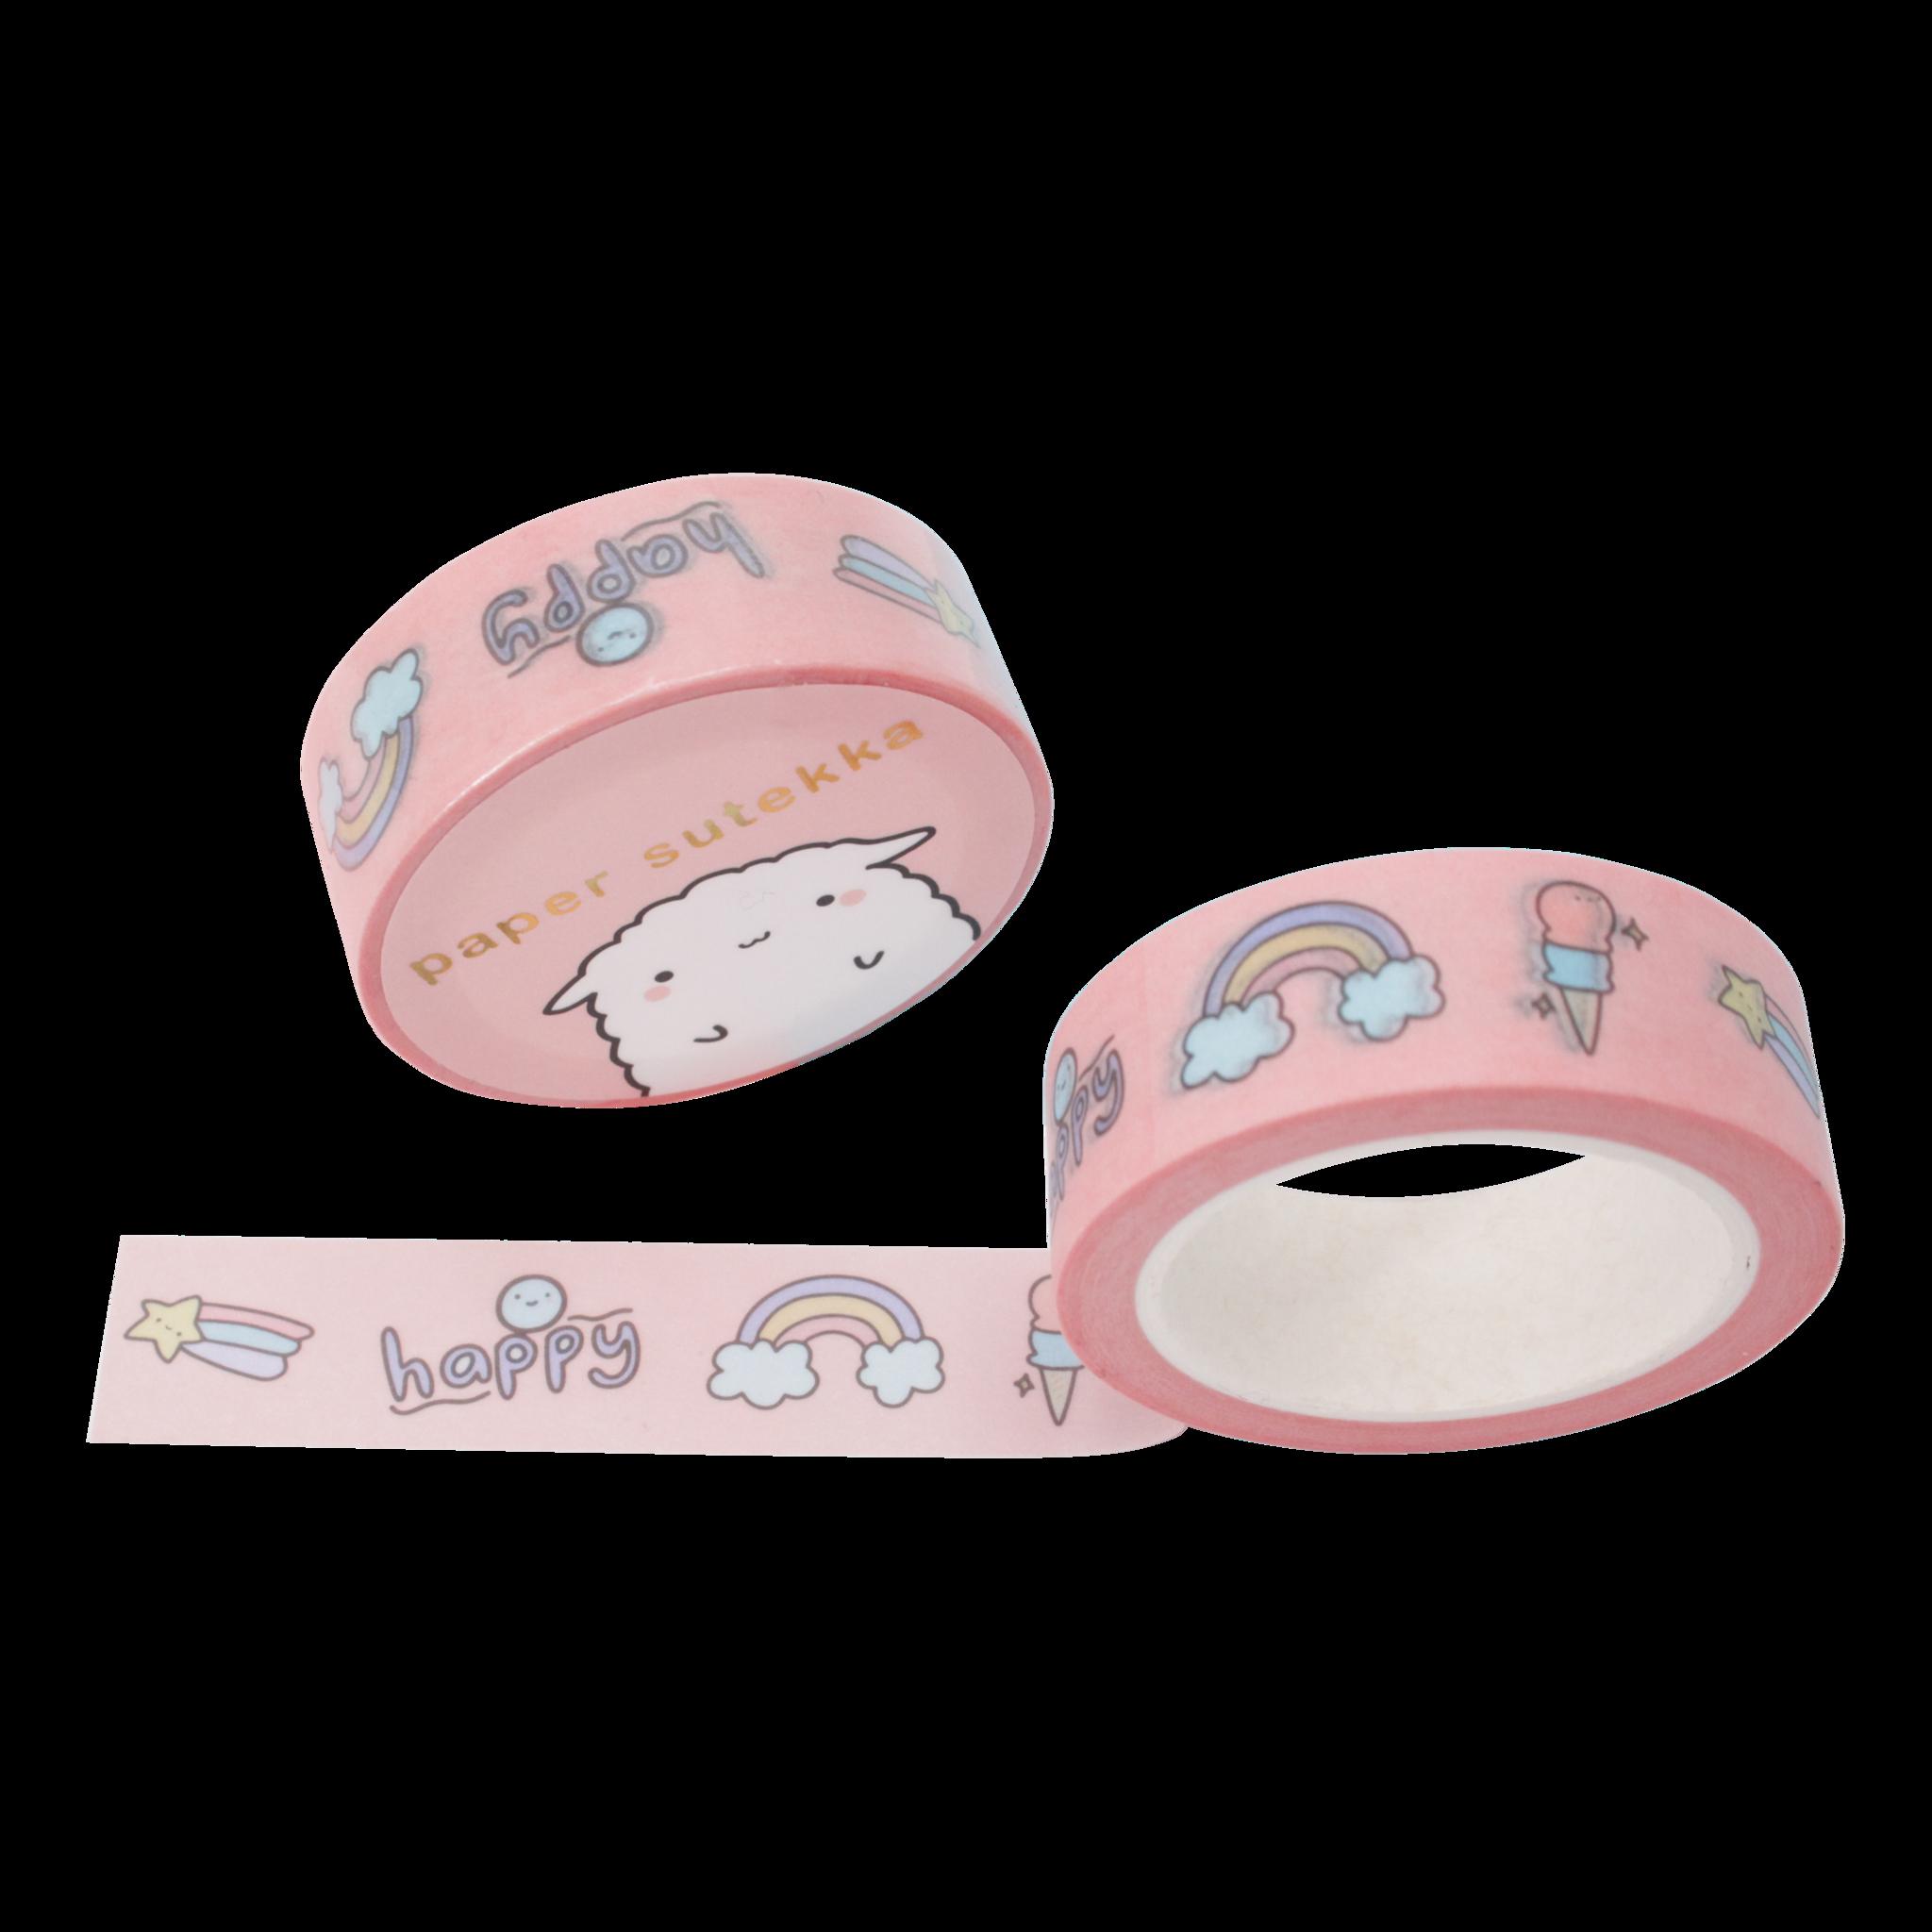 Paper Sutekka Washi Tape - Doodles Happy